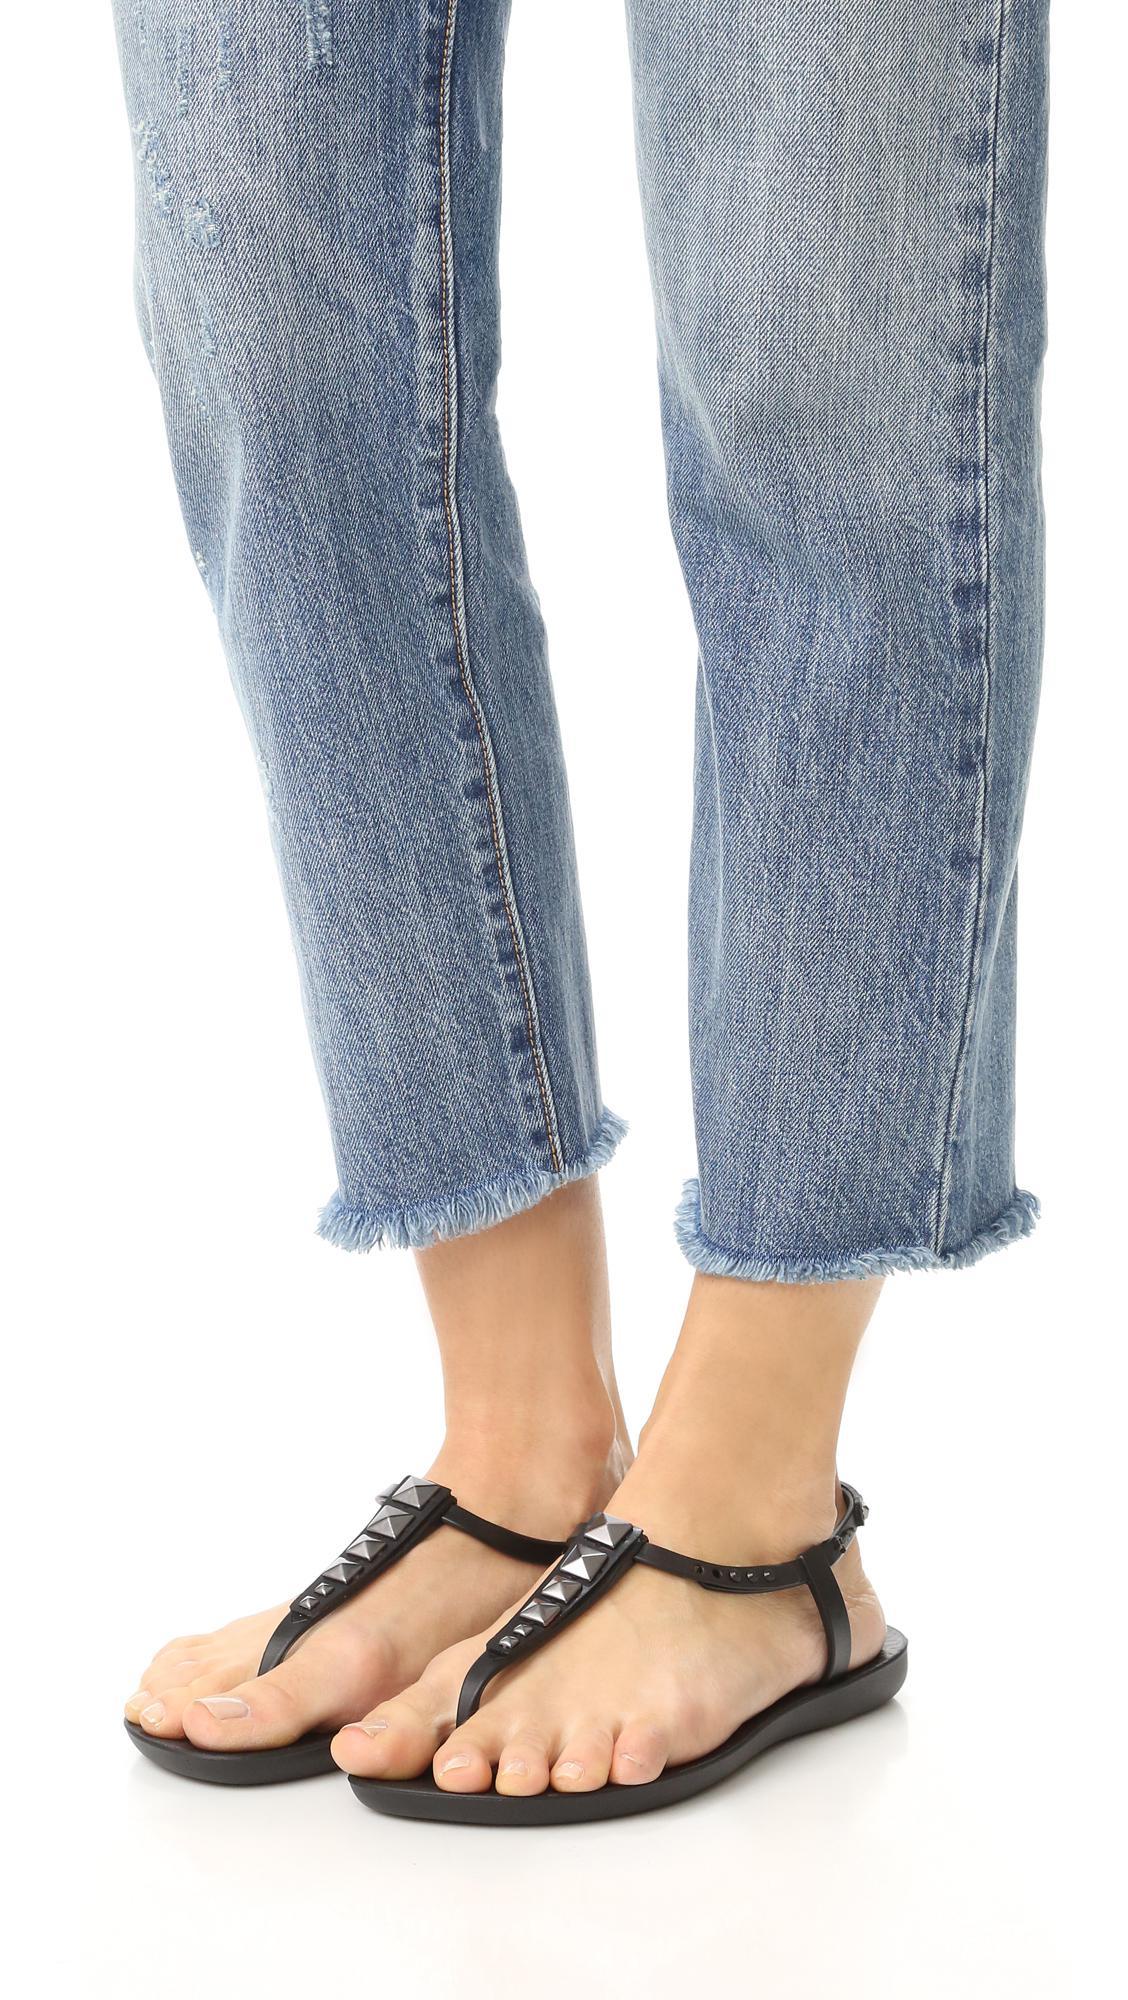 d31d48073bd2 Lyst - Ipanema Premium Lenny Rocker Sandals in Black